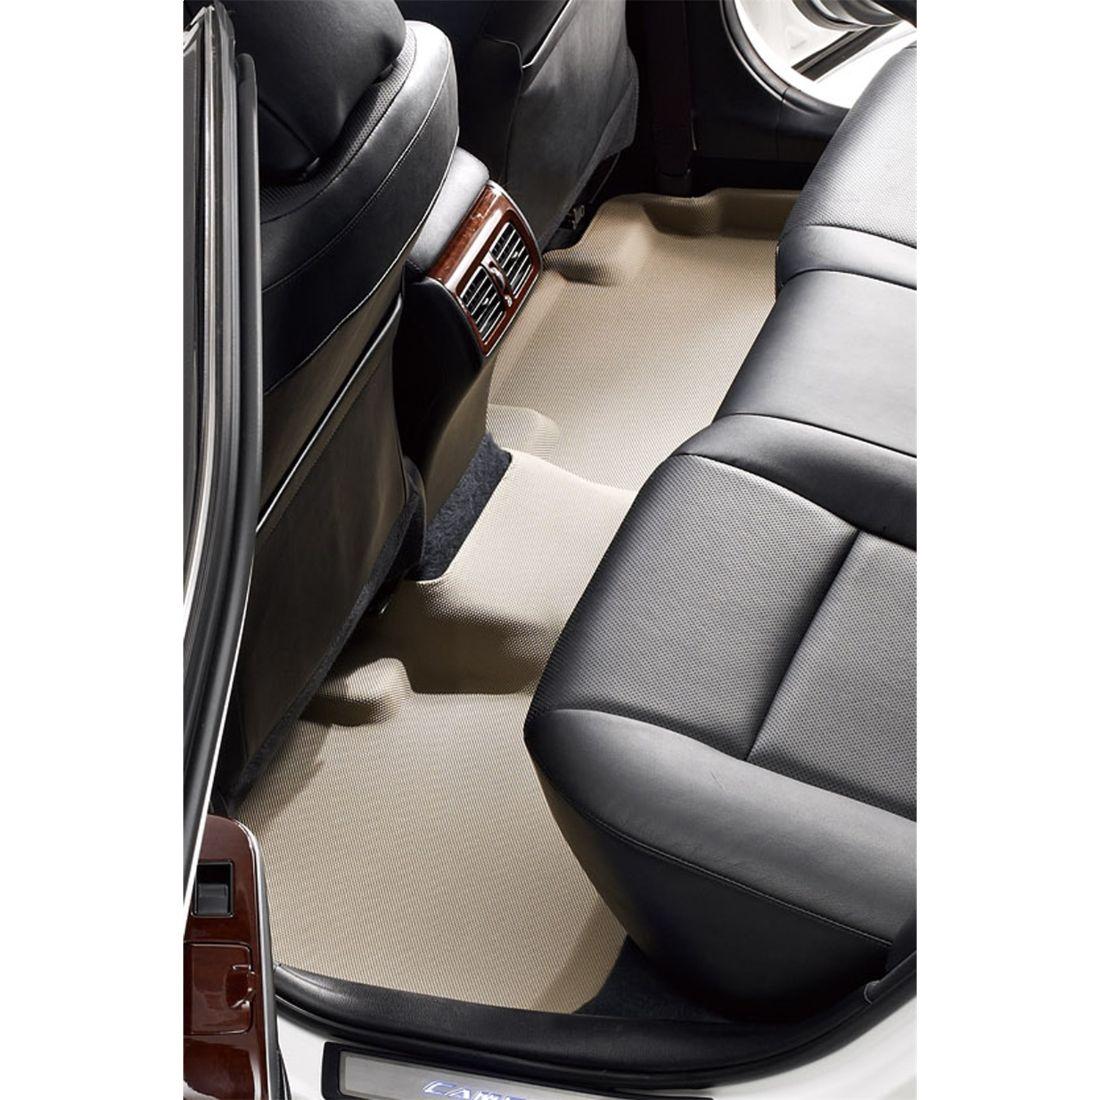 thumbnail 23 - 3D MAXpider Custom Fit KAGU All-Weather Floor Mats for Scion 2013-2015 xB